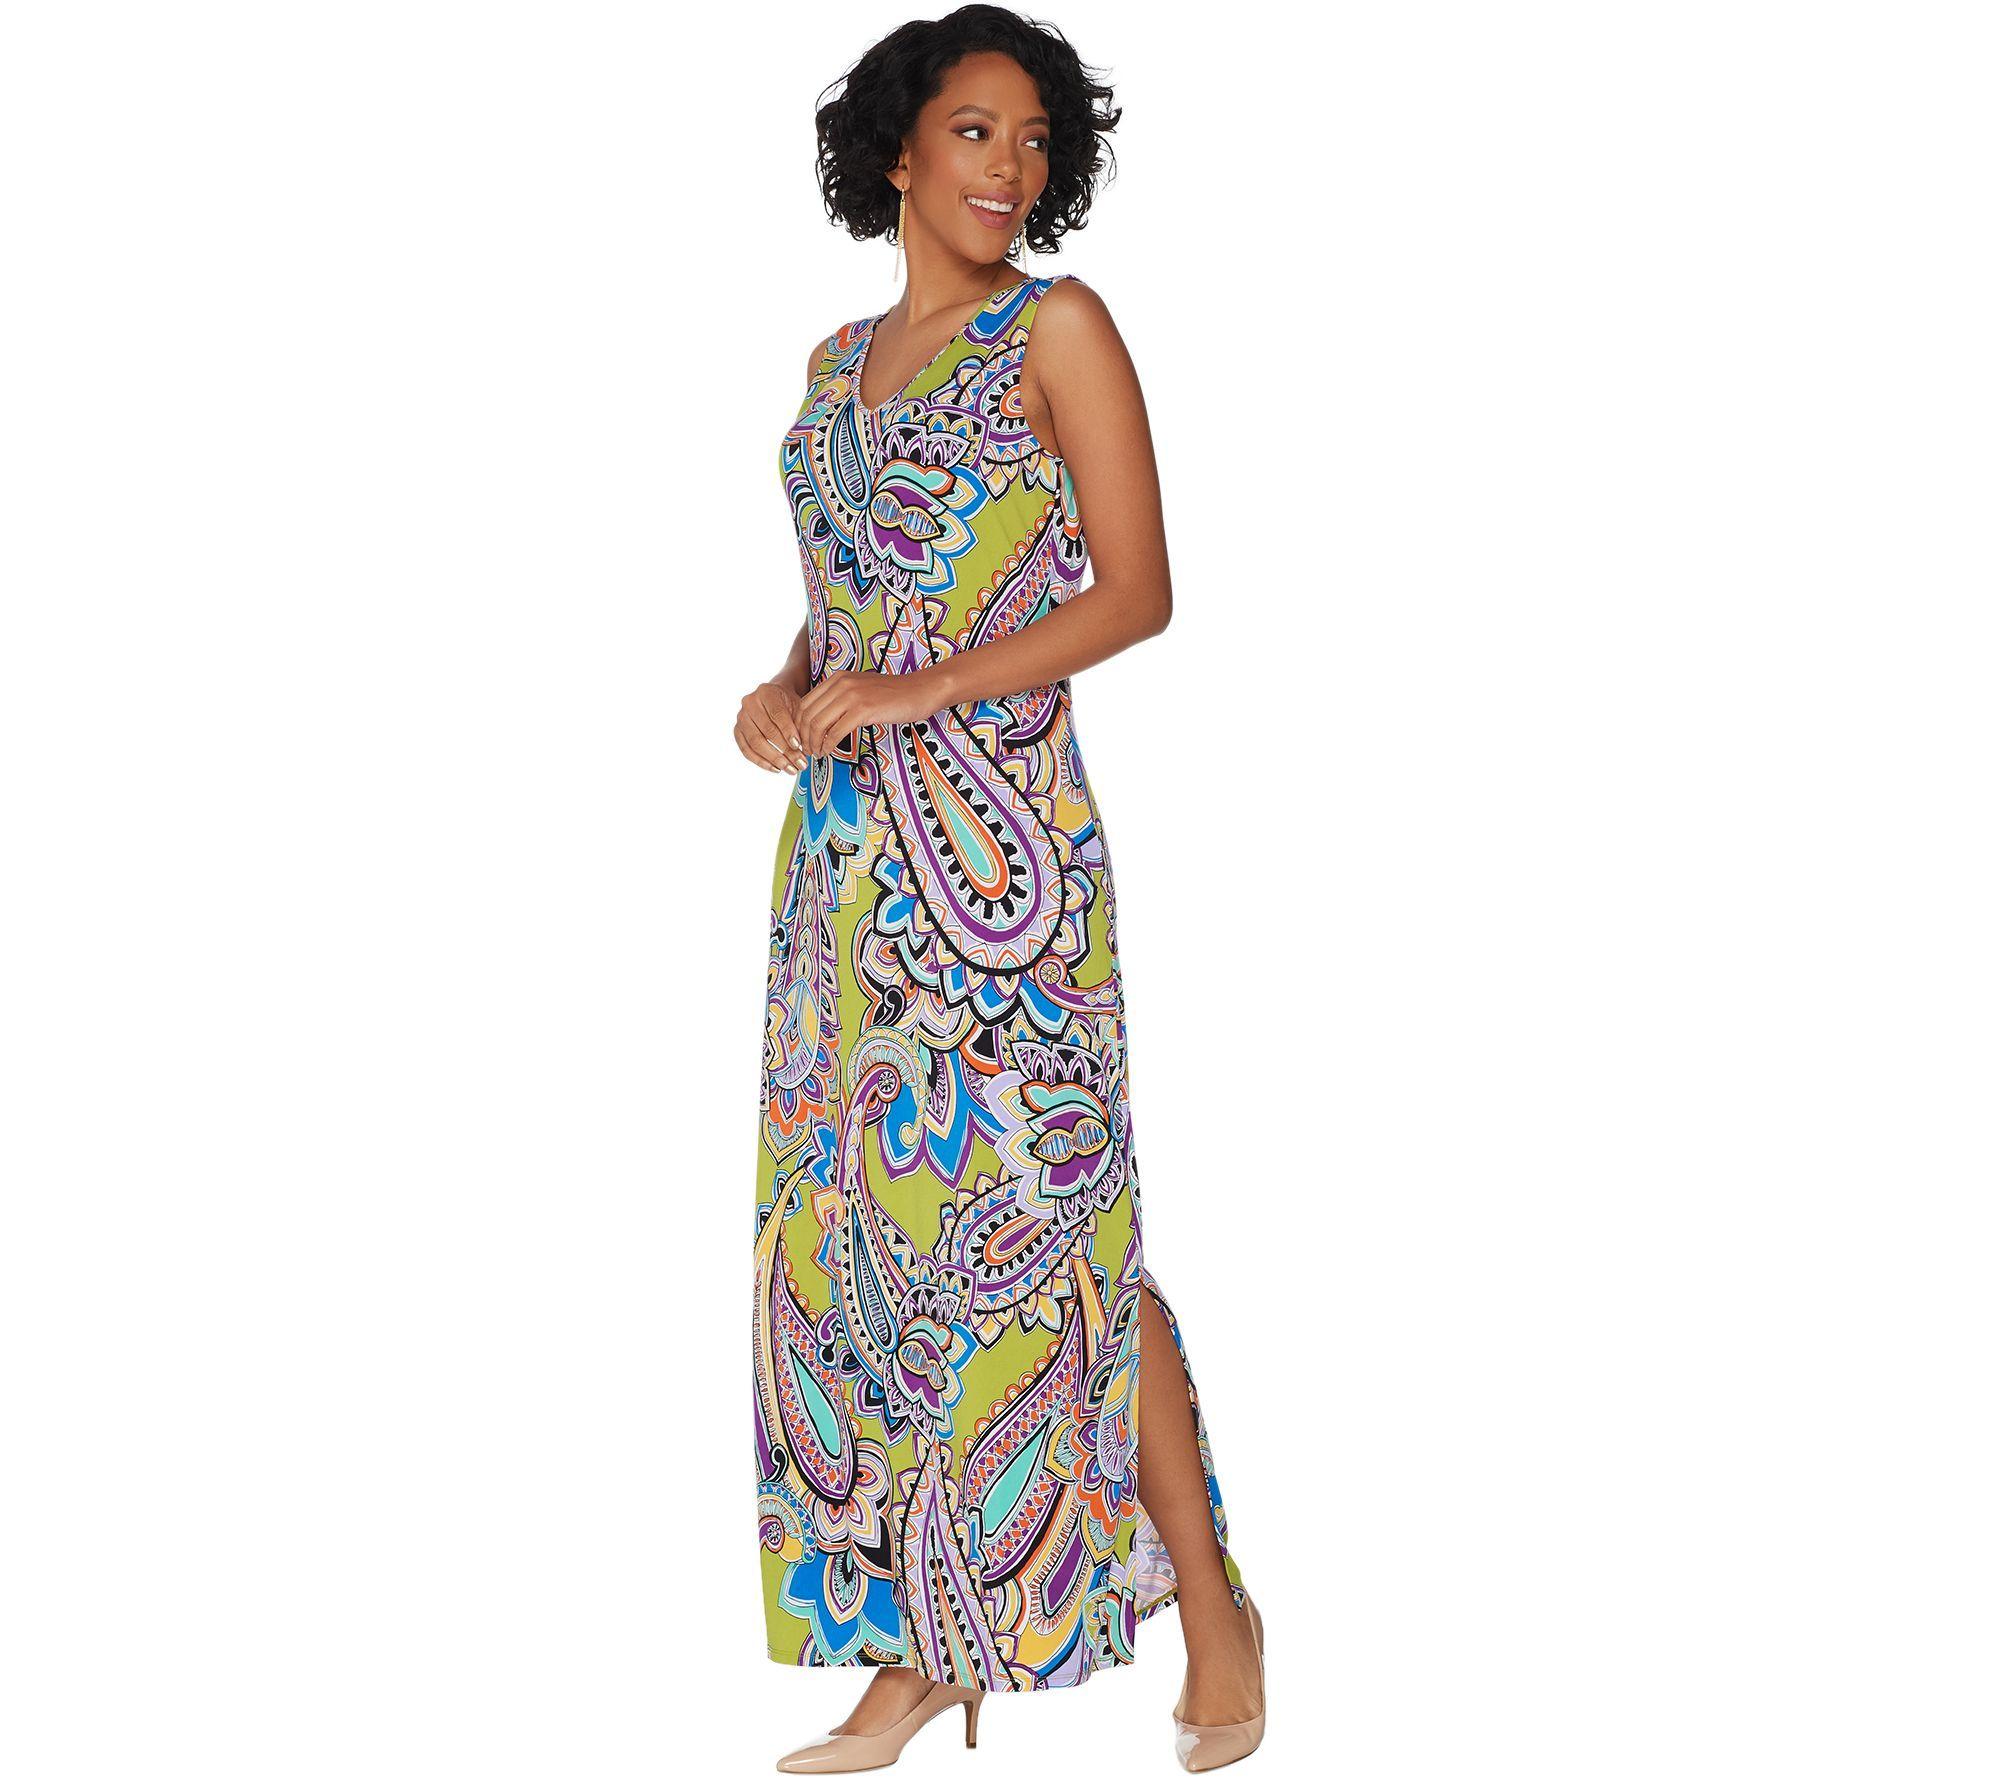 Pin By Virginia Fisher On Fashions Fashion Styles Qvc Fashion Dresses Maxi Dress [ 1778 x 2000 Pixel ]